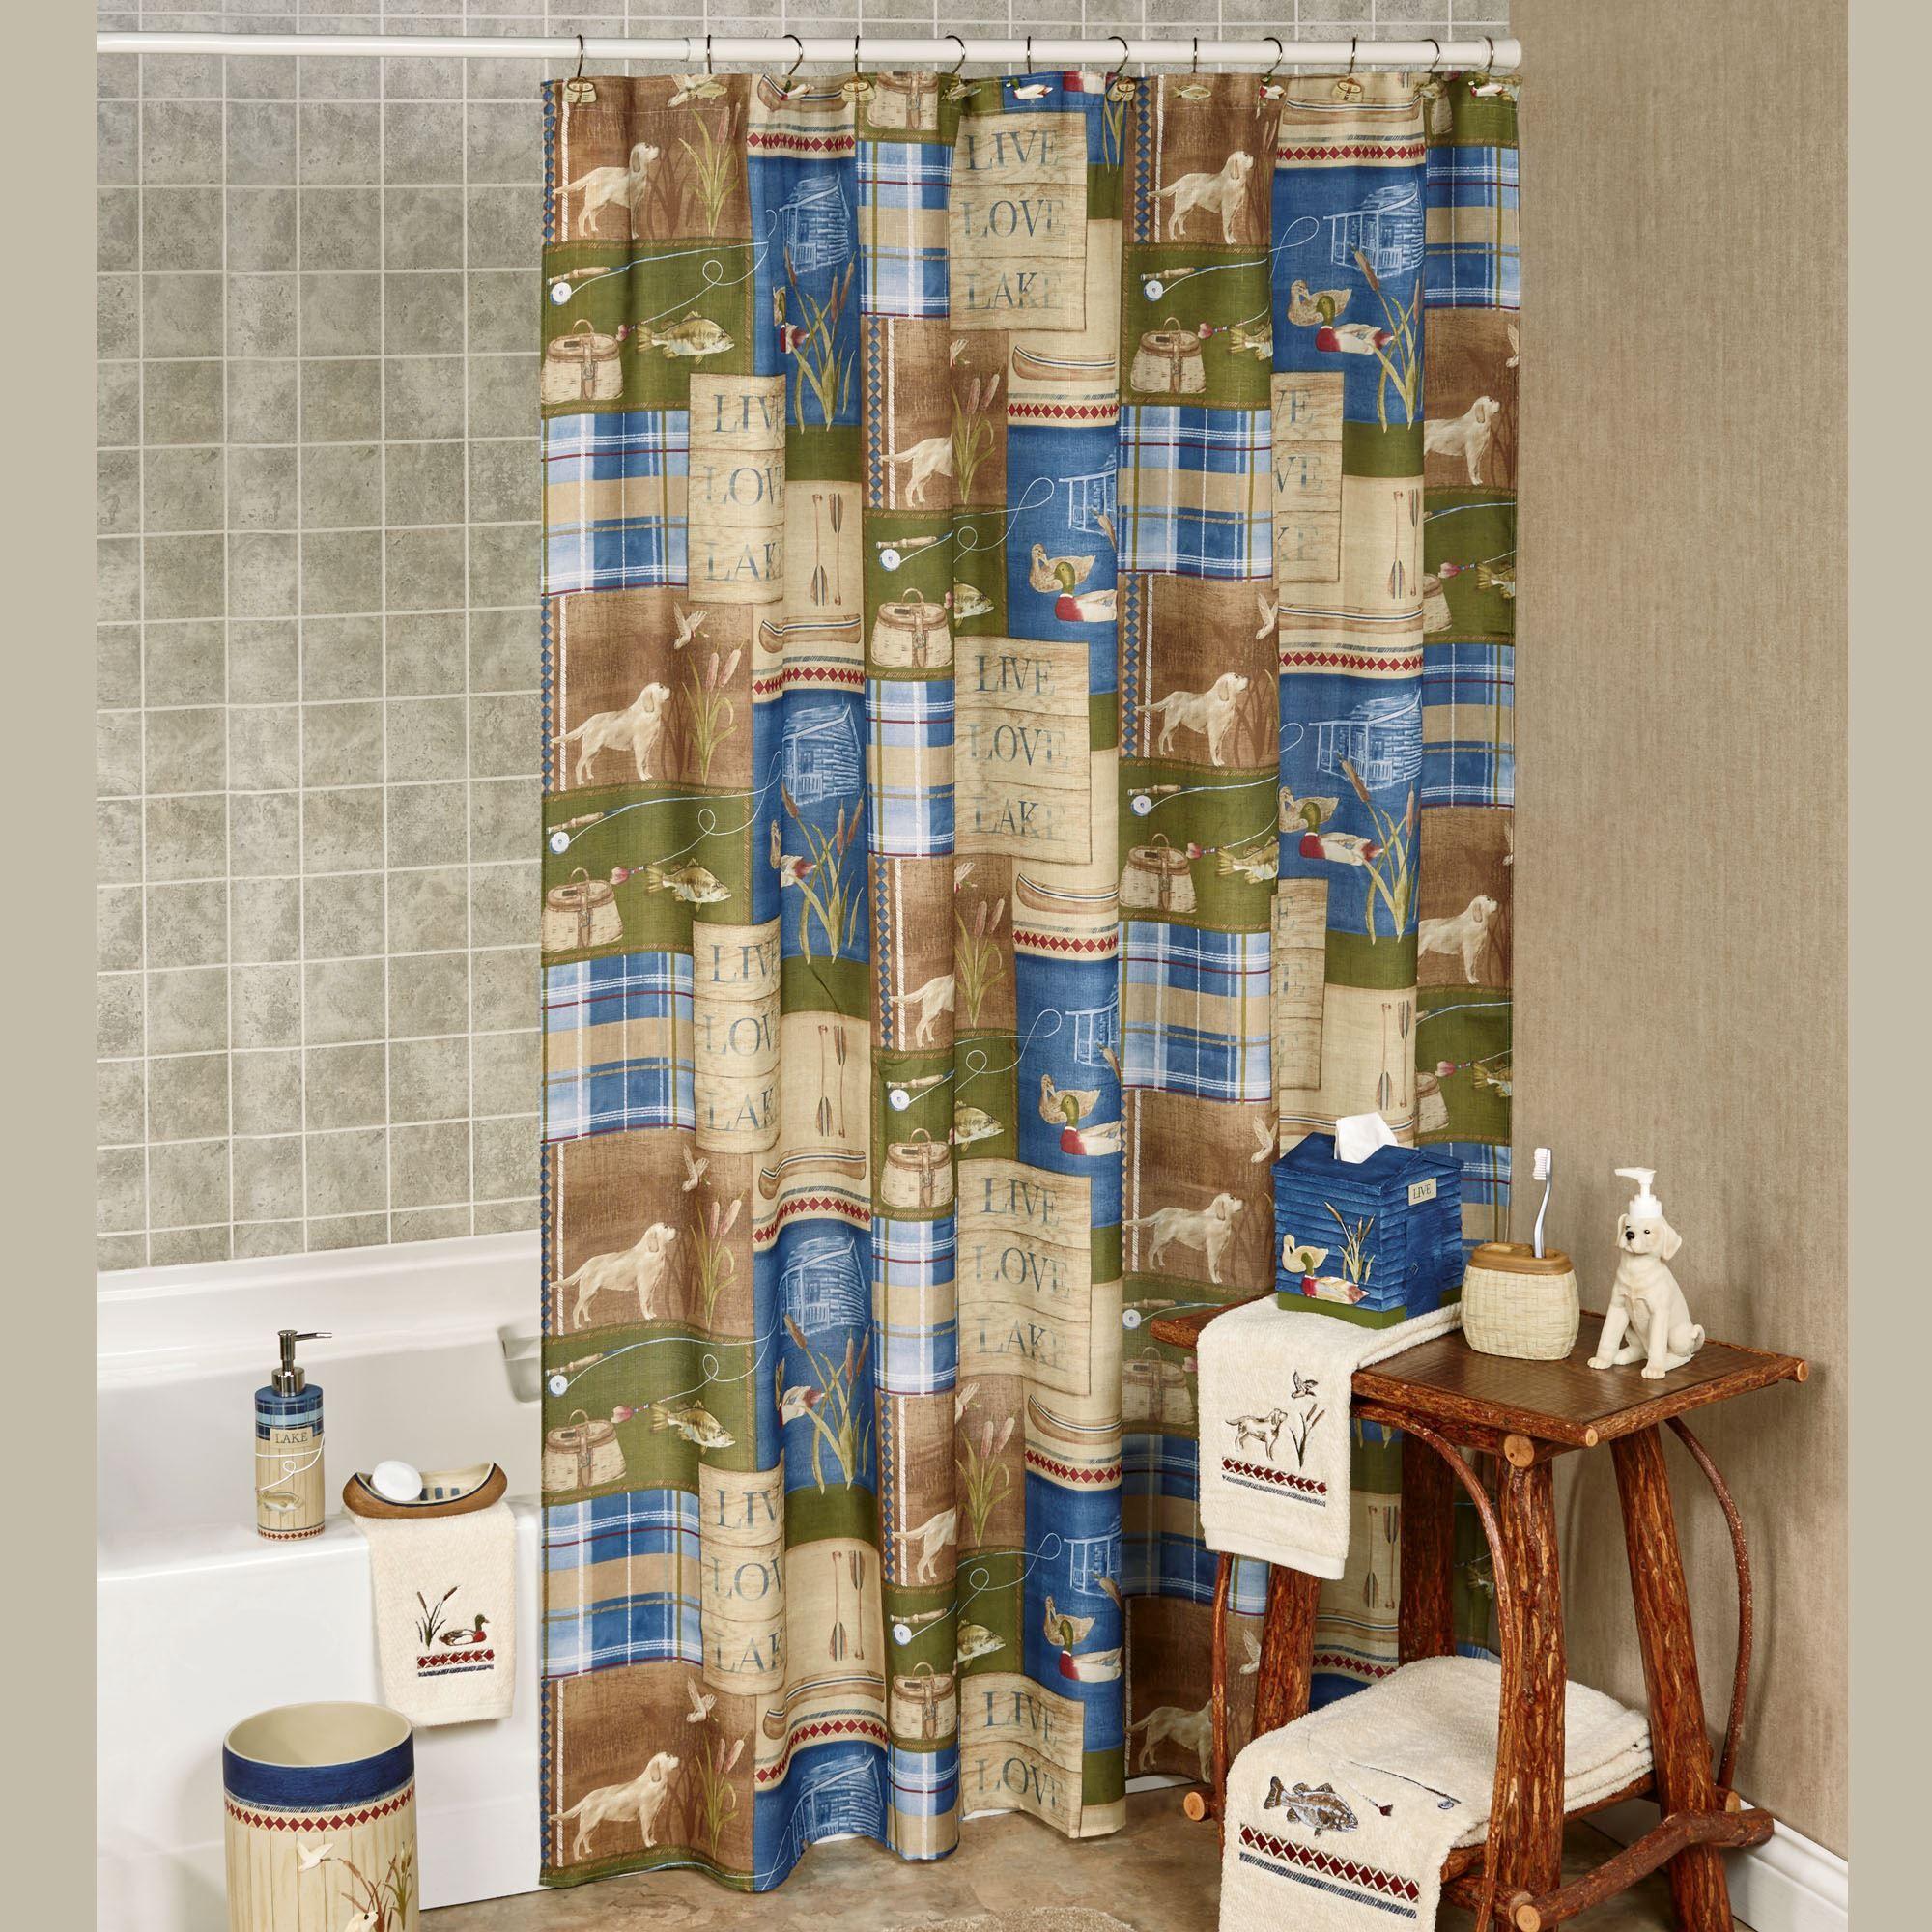 Live Love Lake Rustic Shower Curtain